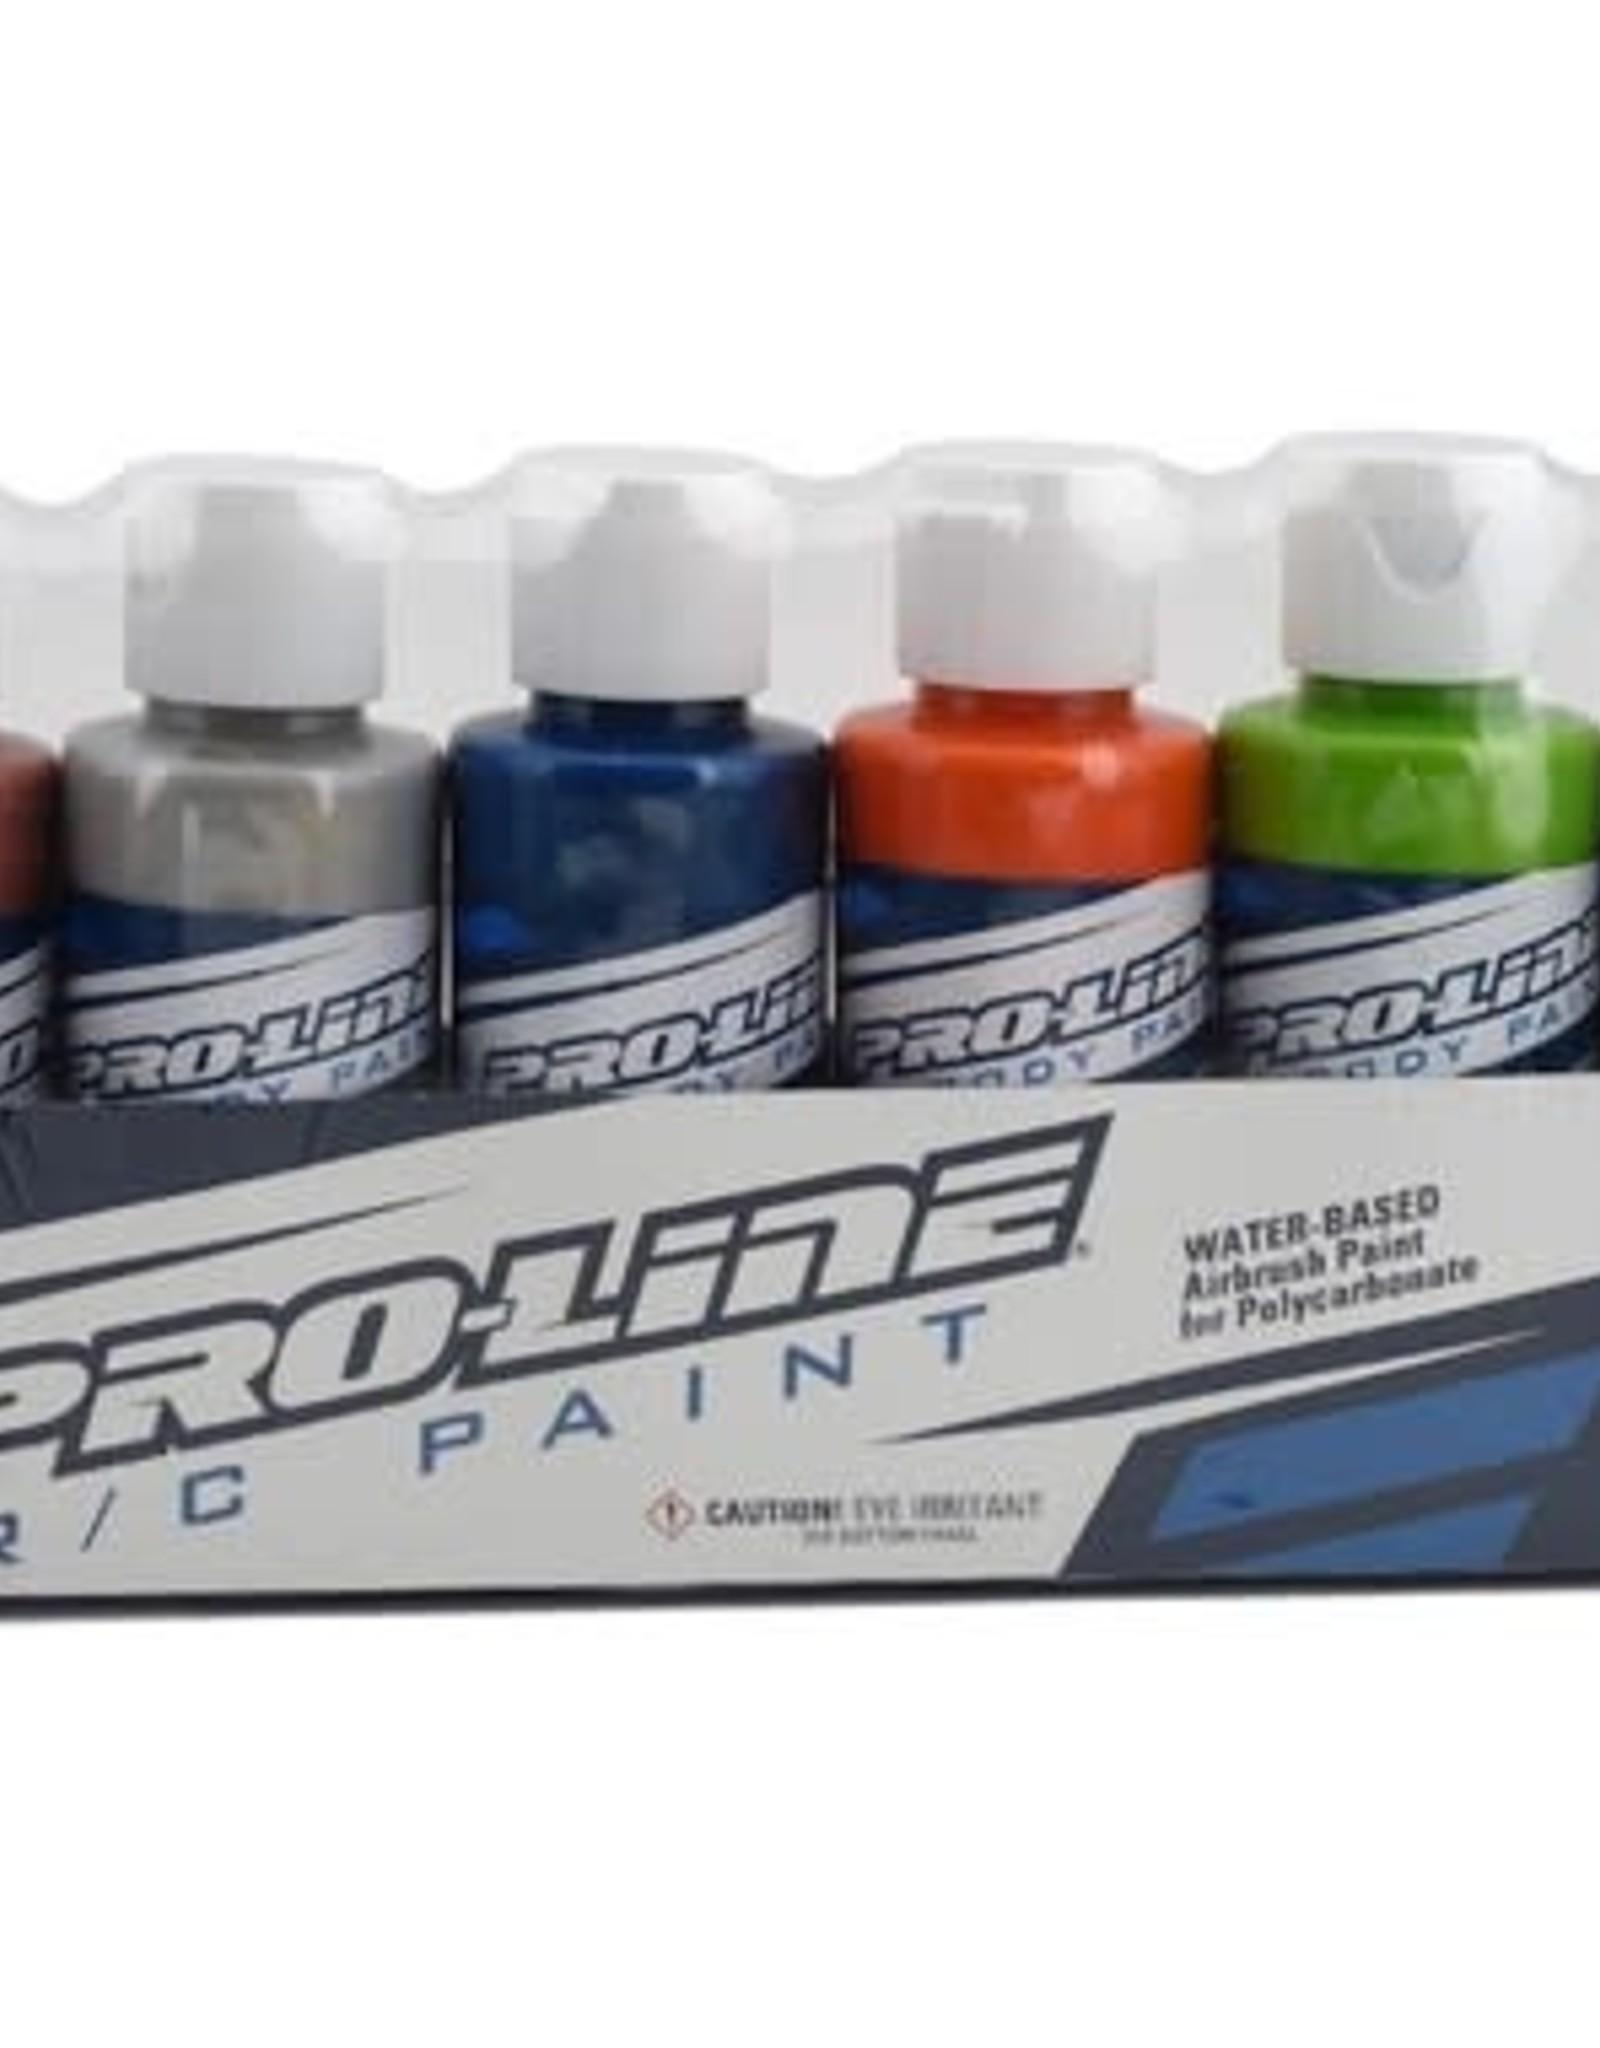 Pro-Line Pro-Line RC Body Airbrush Paint Metallic/Pearl Color Set (6)